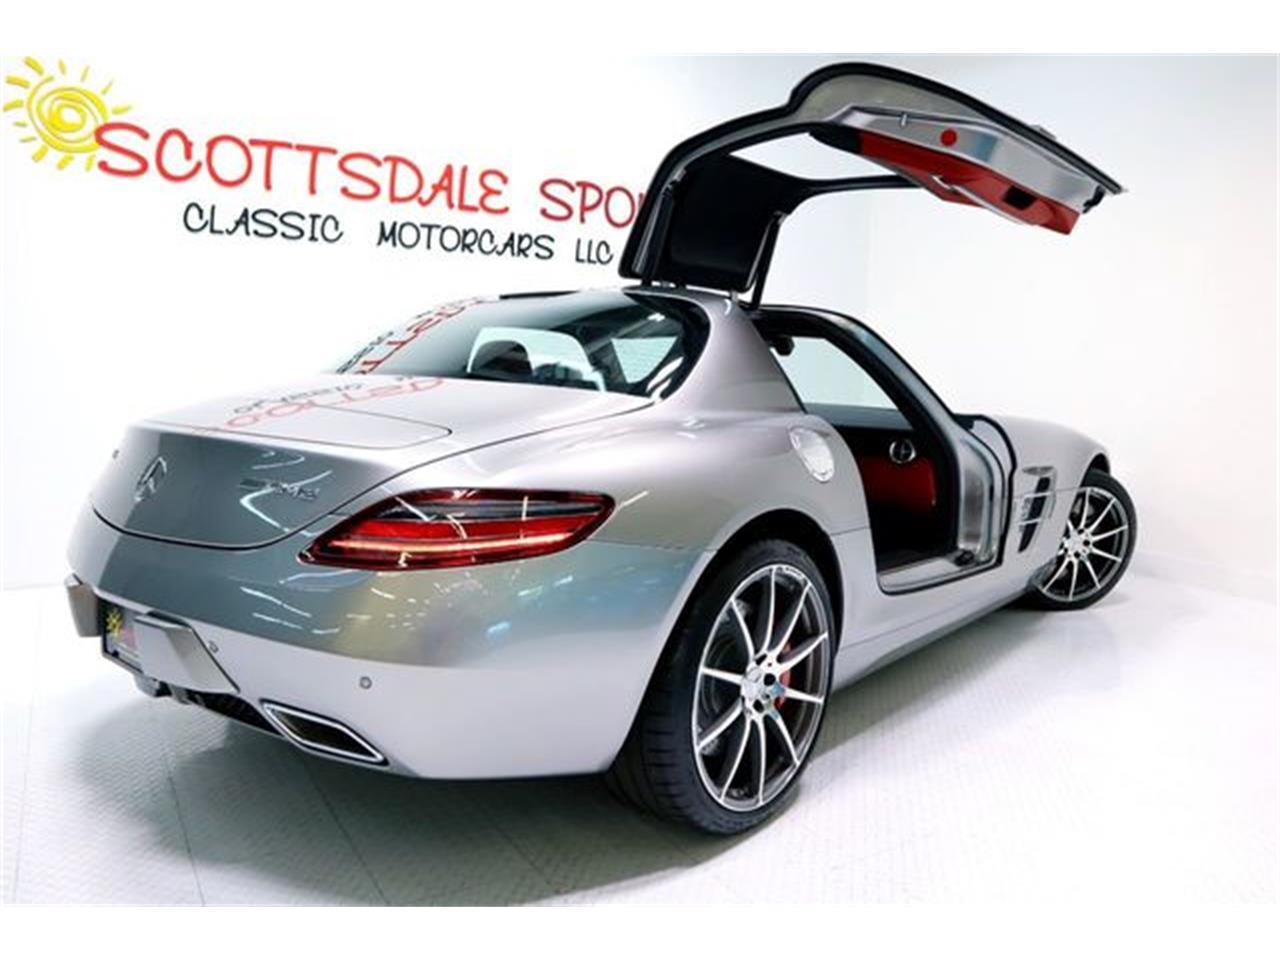 2012 Mercedes-Benz SLS AMG (CC-1391153) for sale in Scottsdale, Arizona